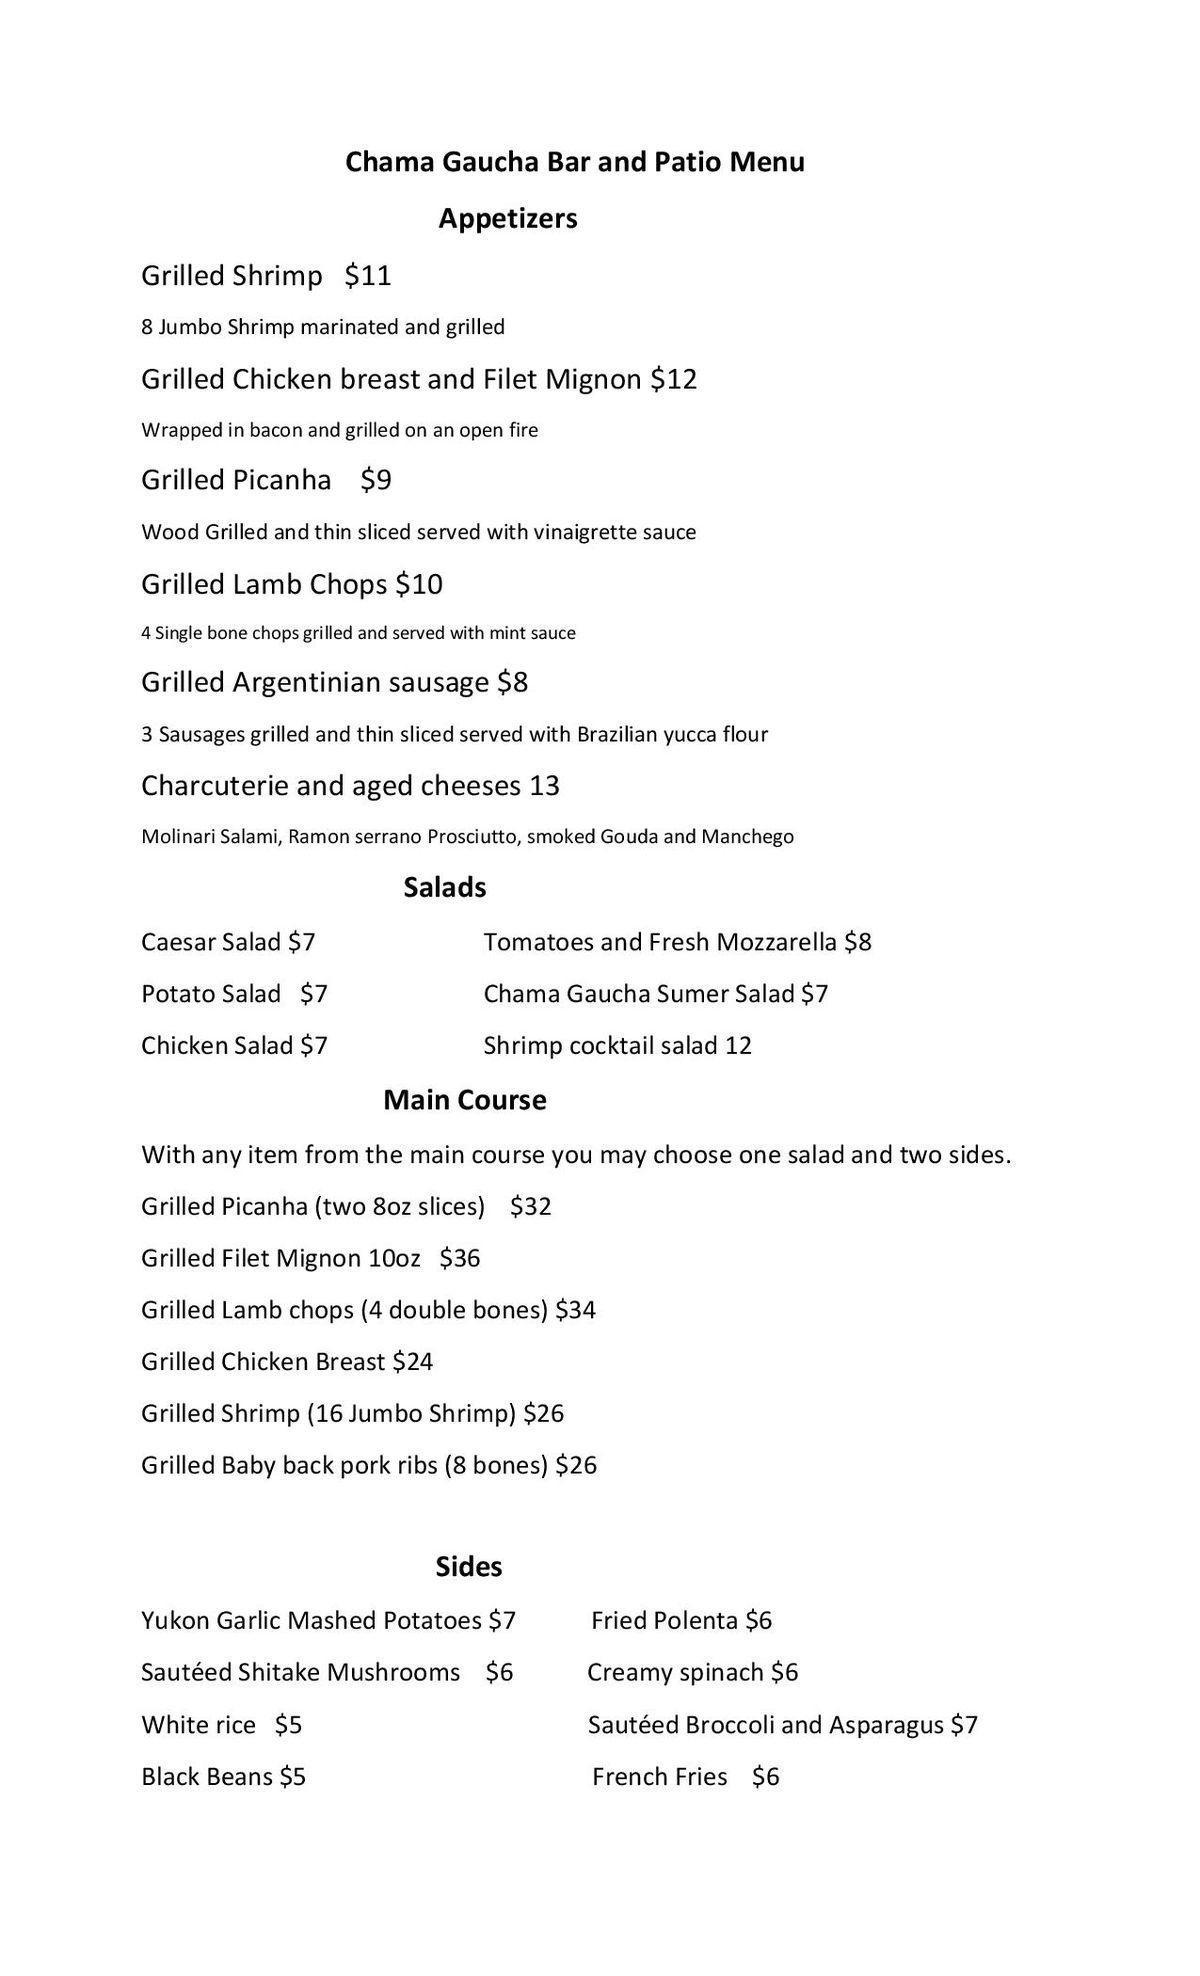 Chama Gaucha menu 2